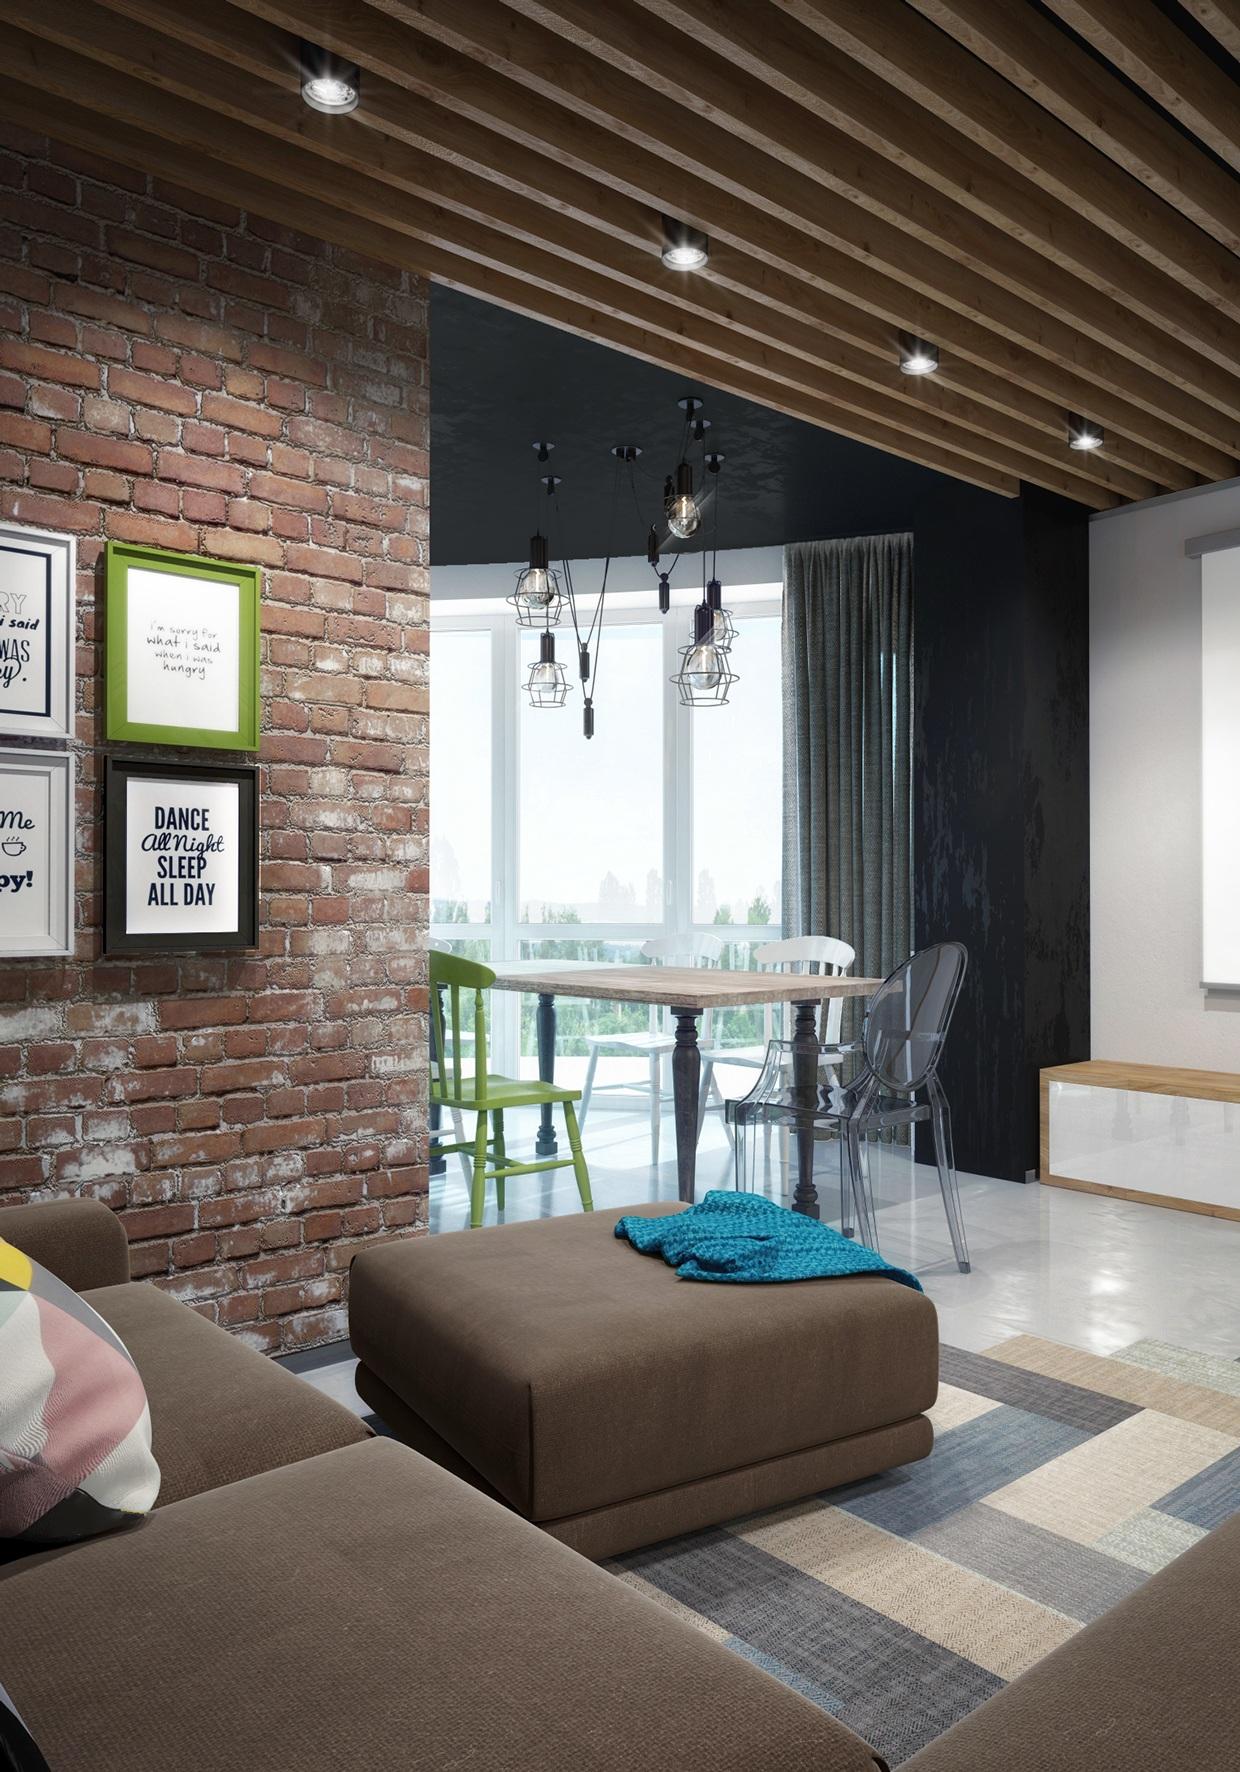 Credit to httpwwwhome designingcom201411three creative lofts fit for stylish artists Extraordinary